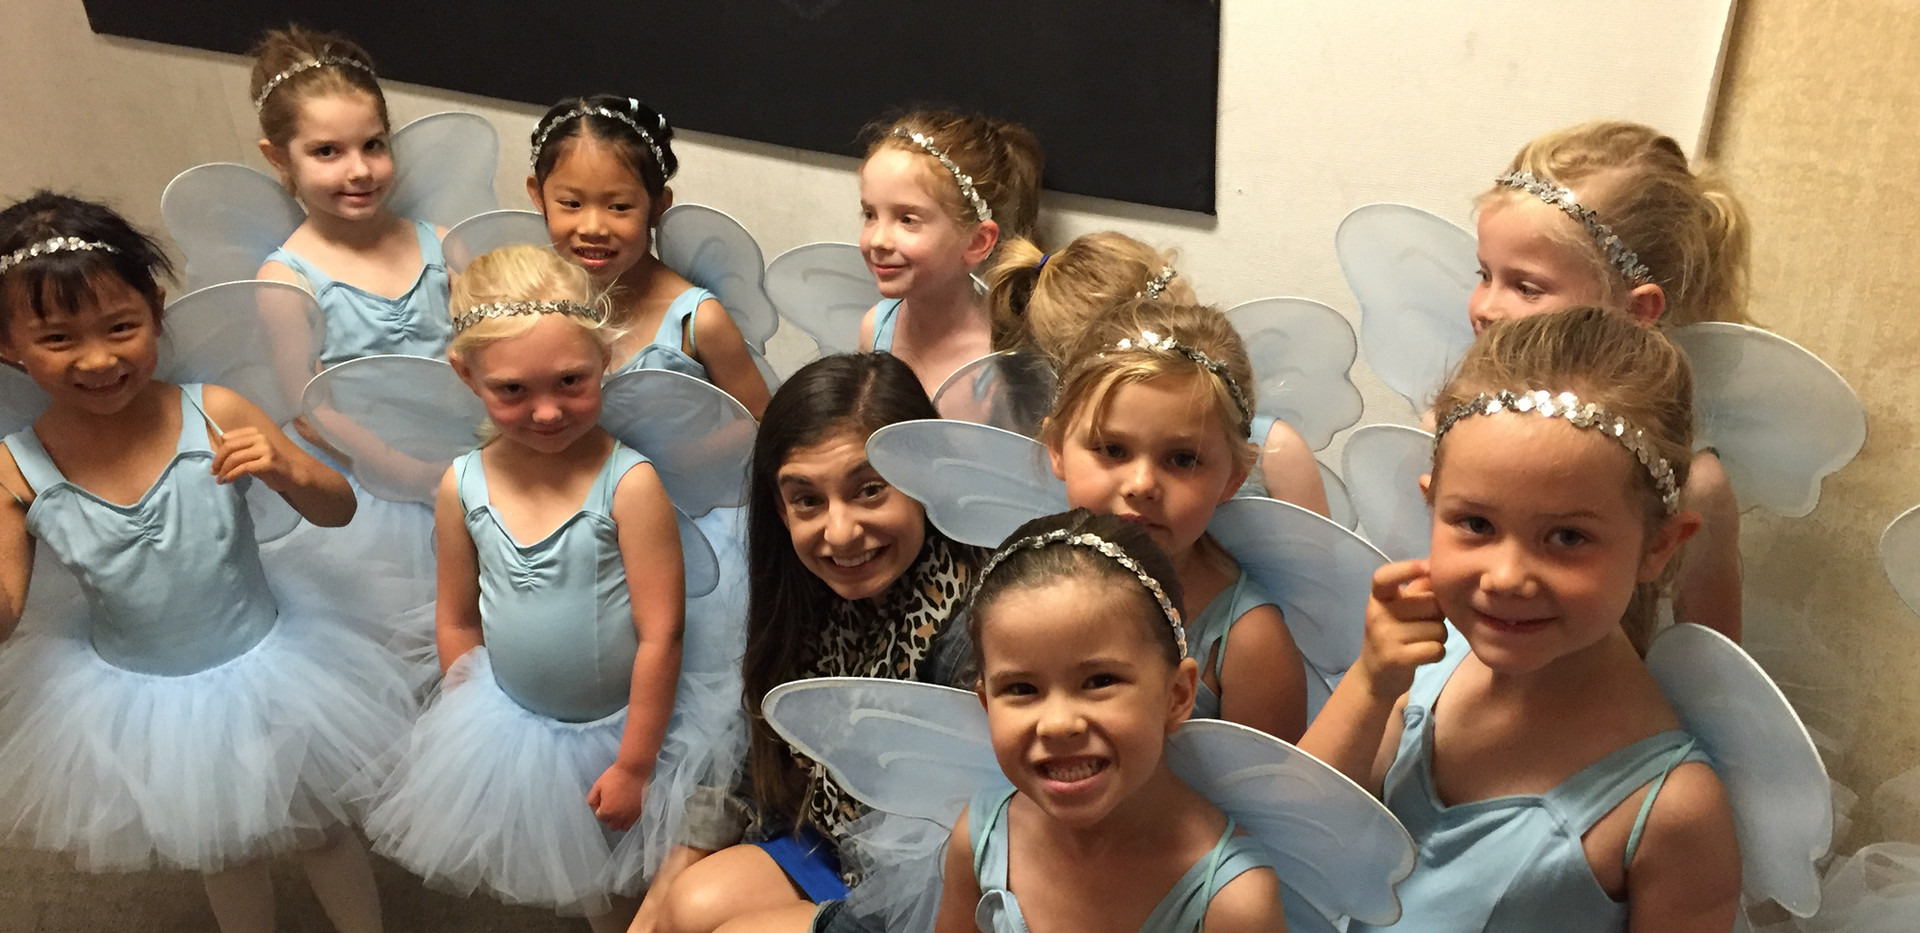 Backstage Fairies